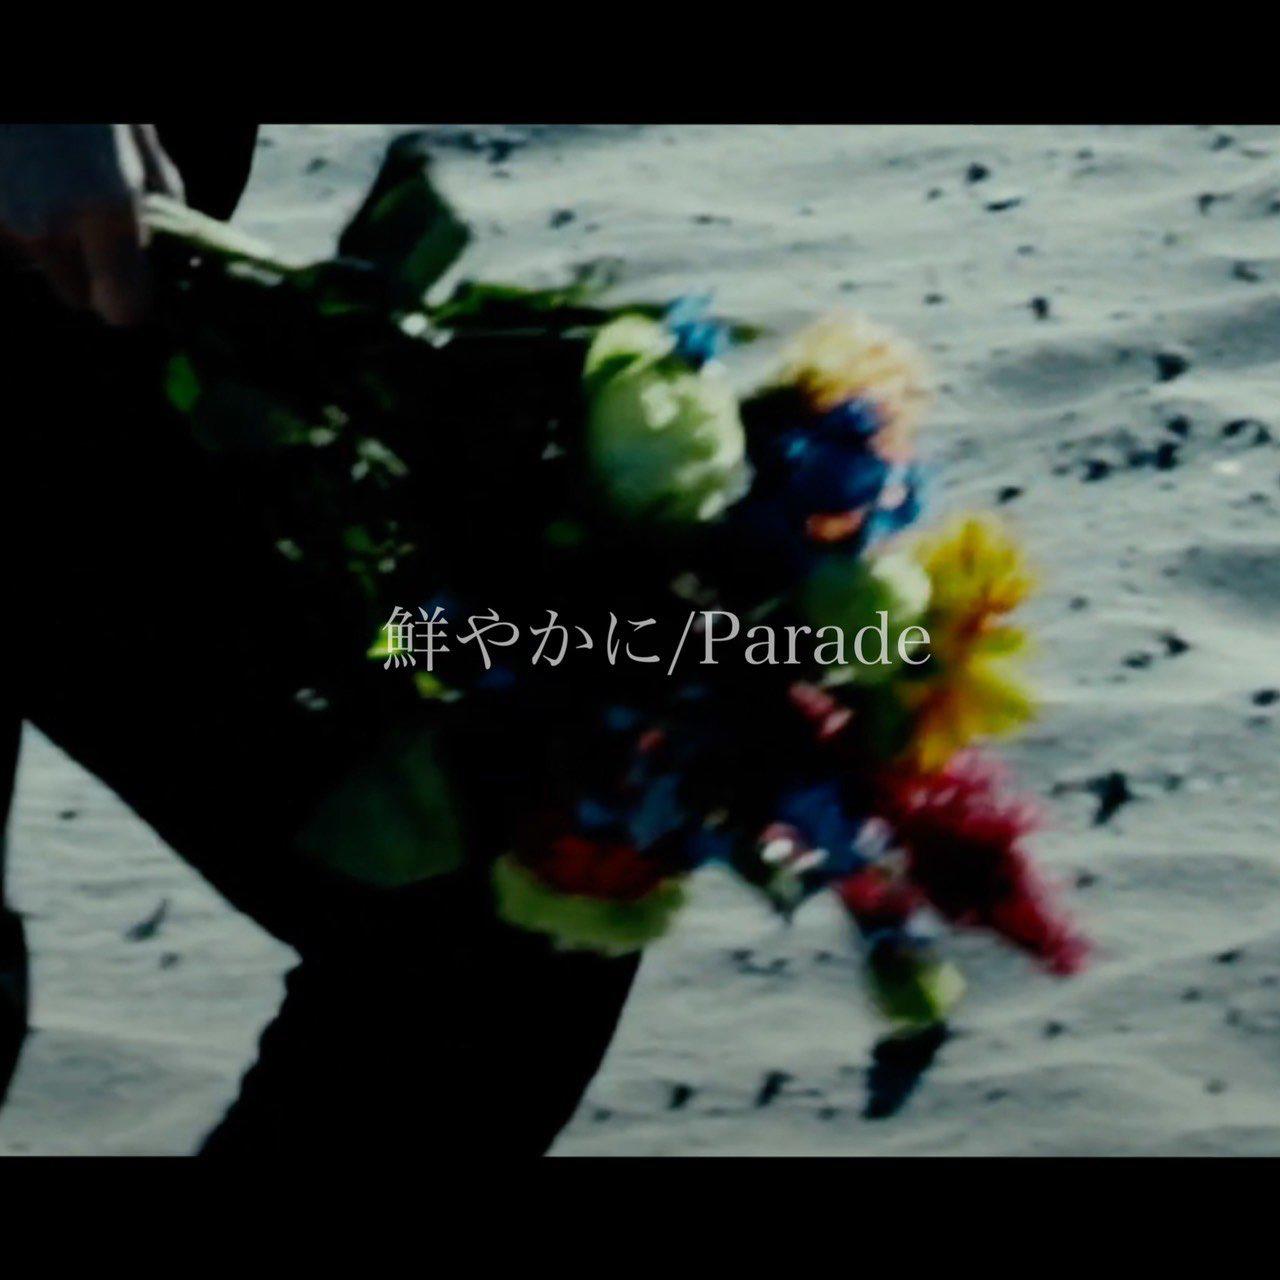 20201224_maxi single_鮮やかに:Parade